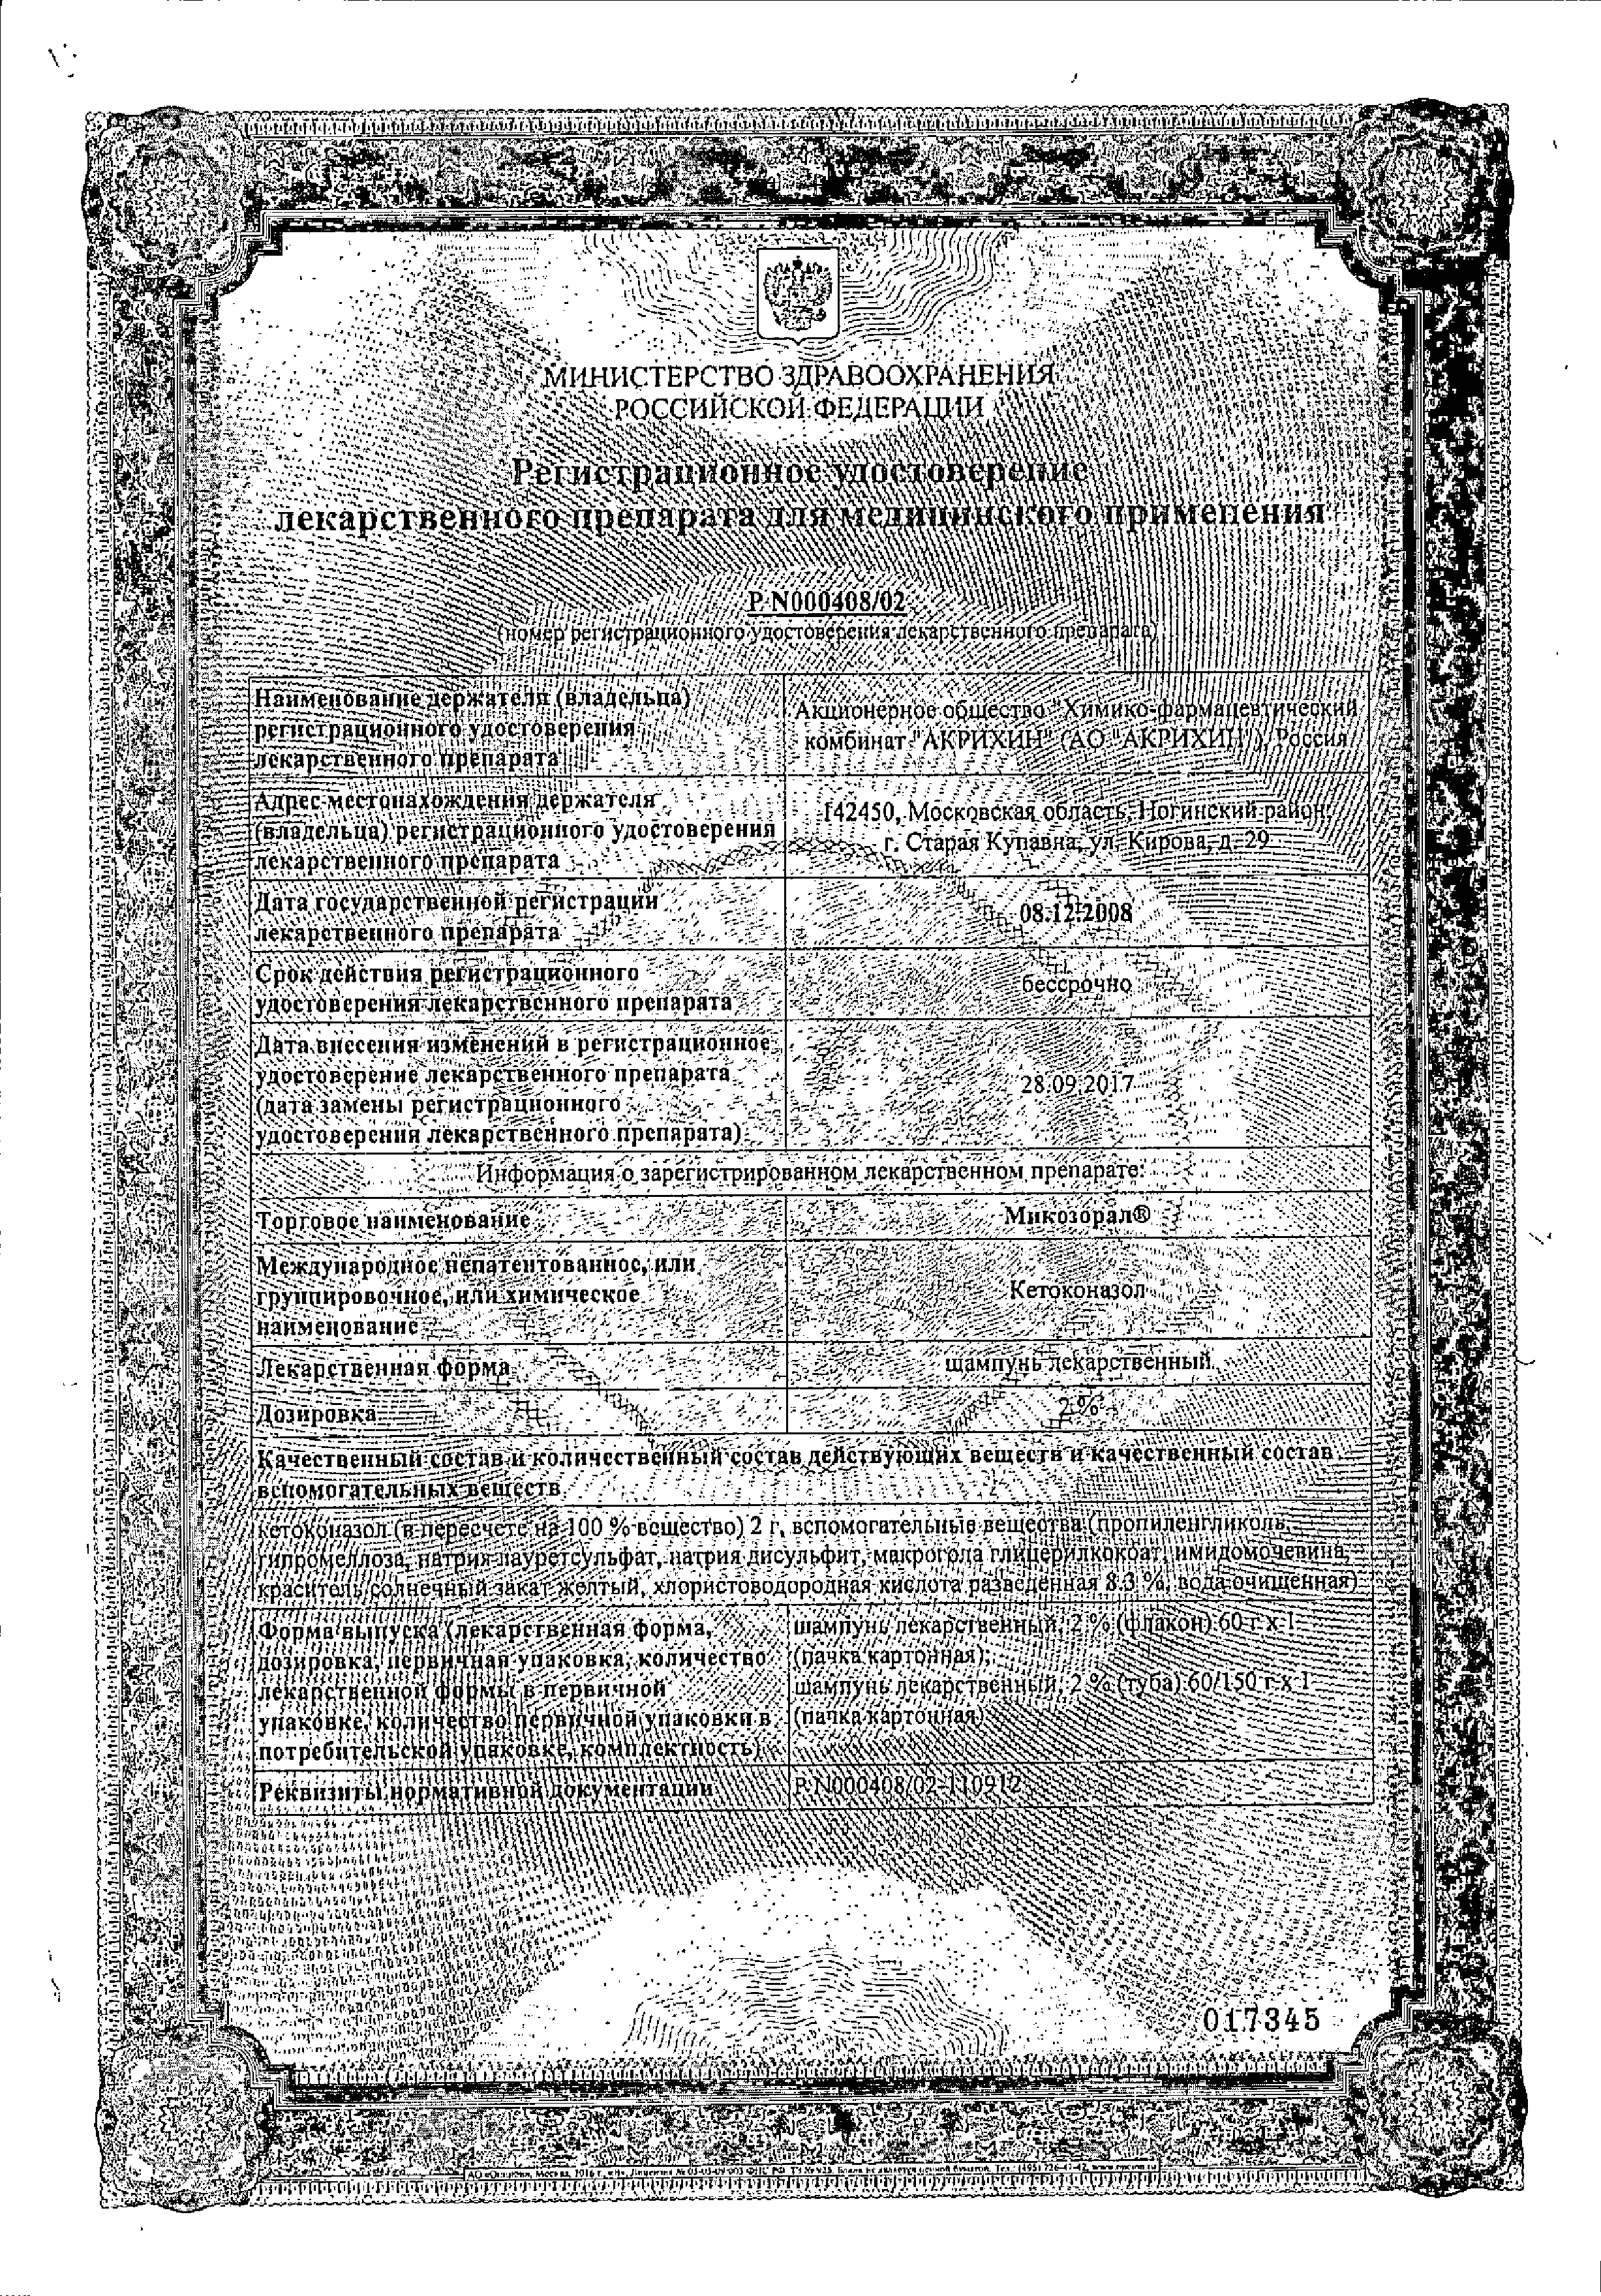 Микозорал сертификат